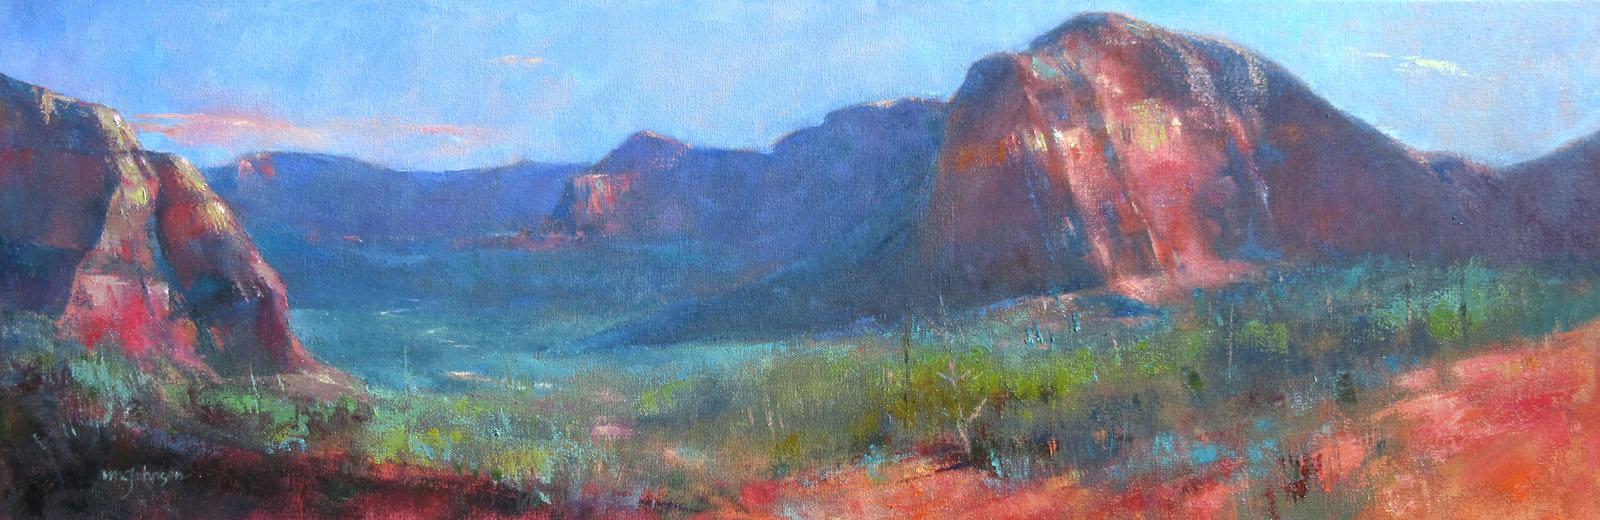 Secret Mountain Wilde... by  Michael Chesley Johnson - Masterpiece Online